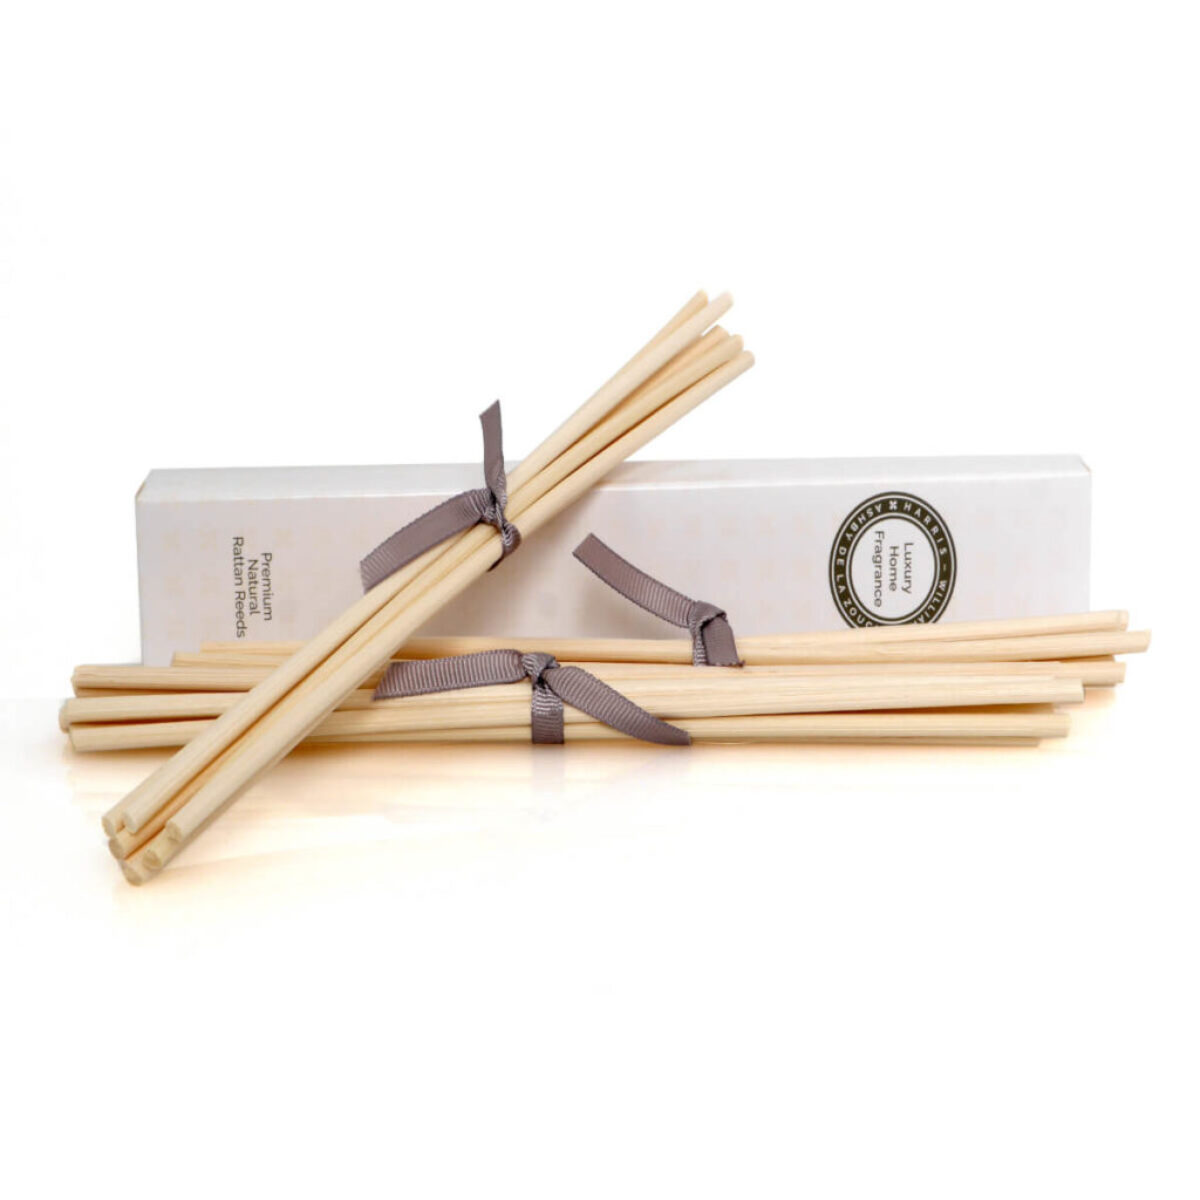 Premium Natural Rattan Reeds 3 Bundles